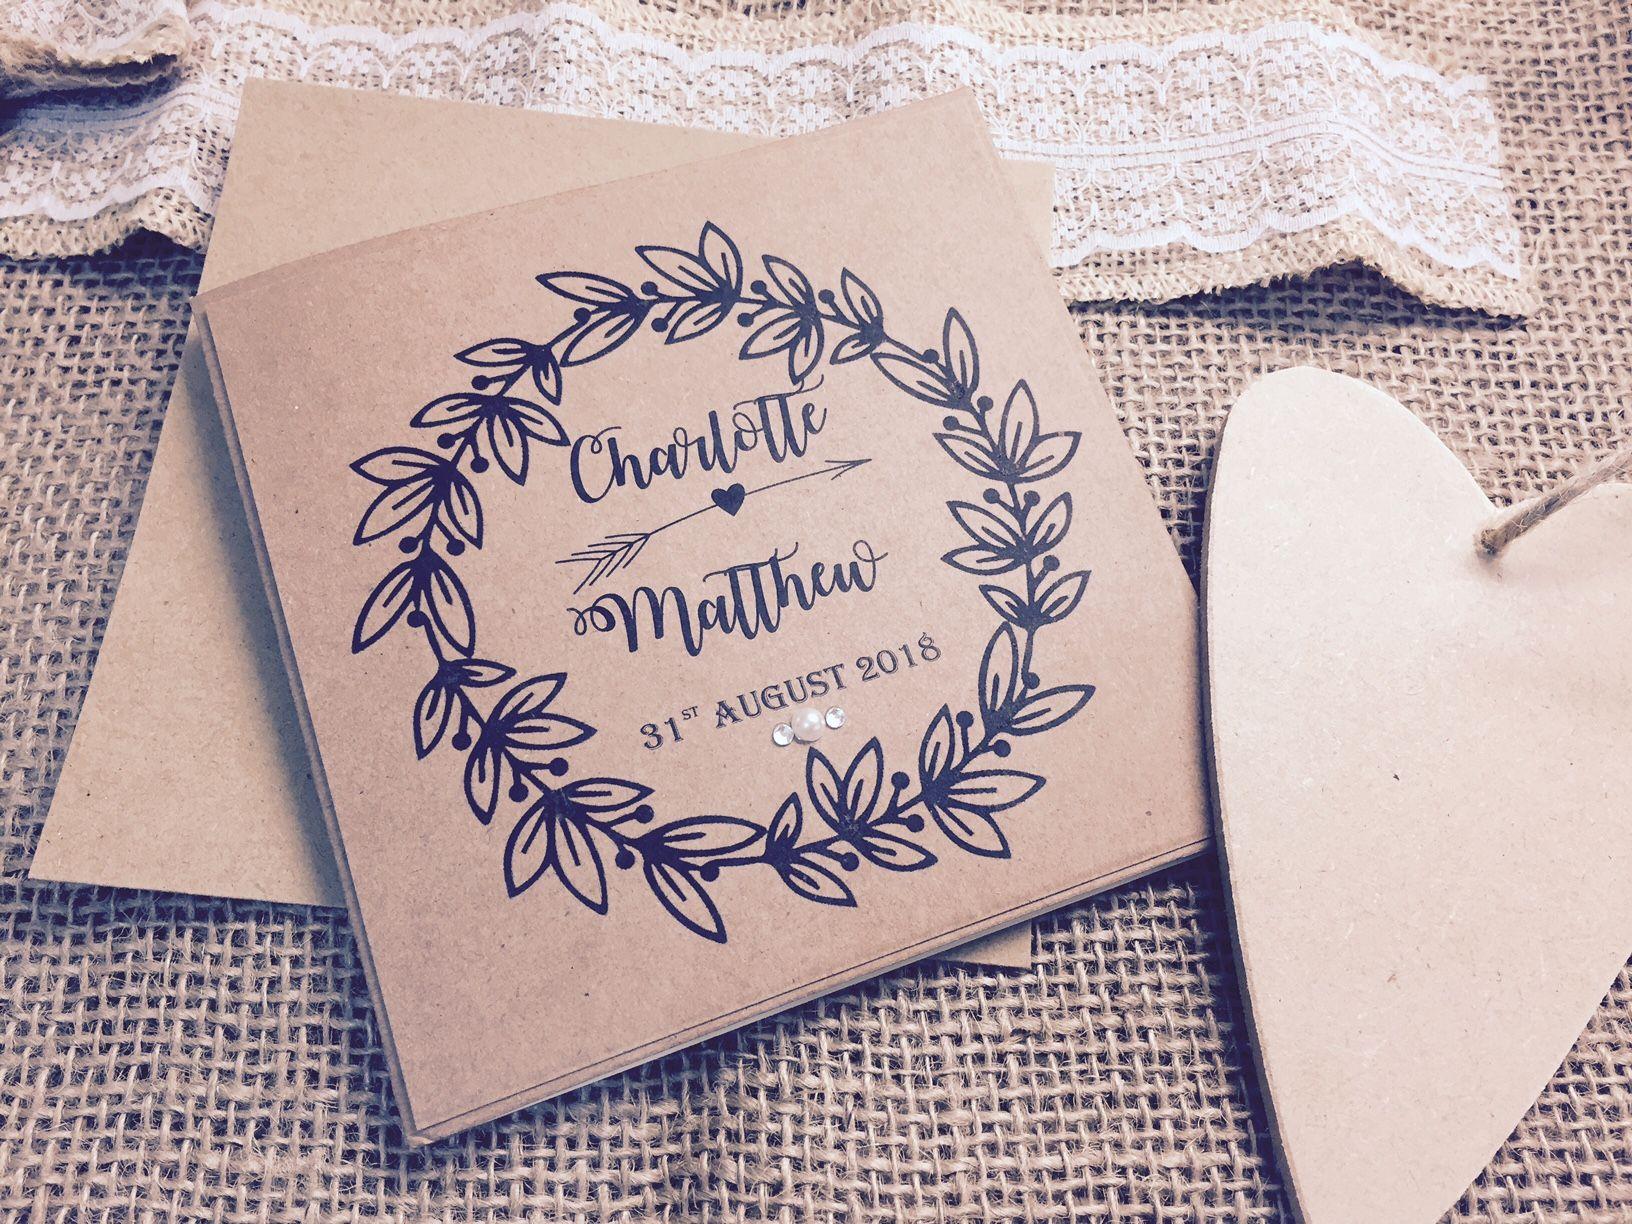 Beautiful rustic style invitation